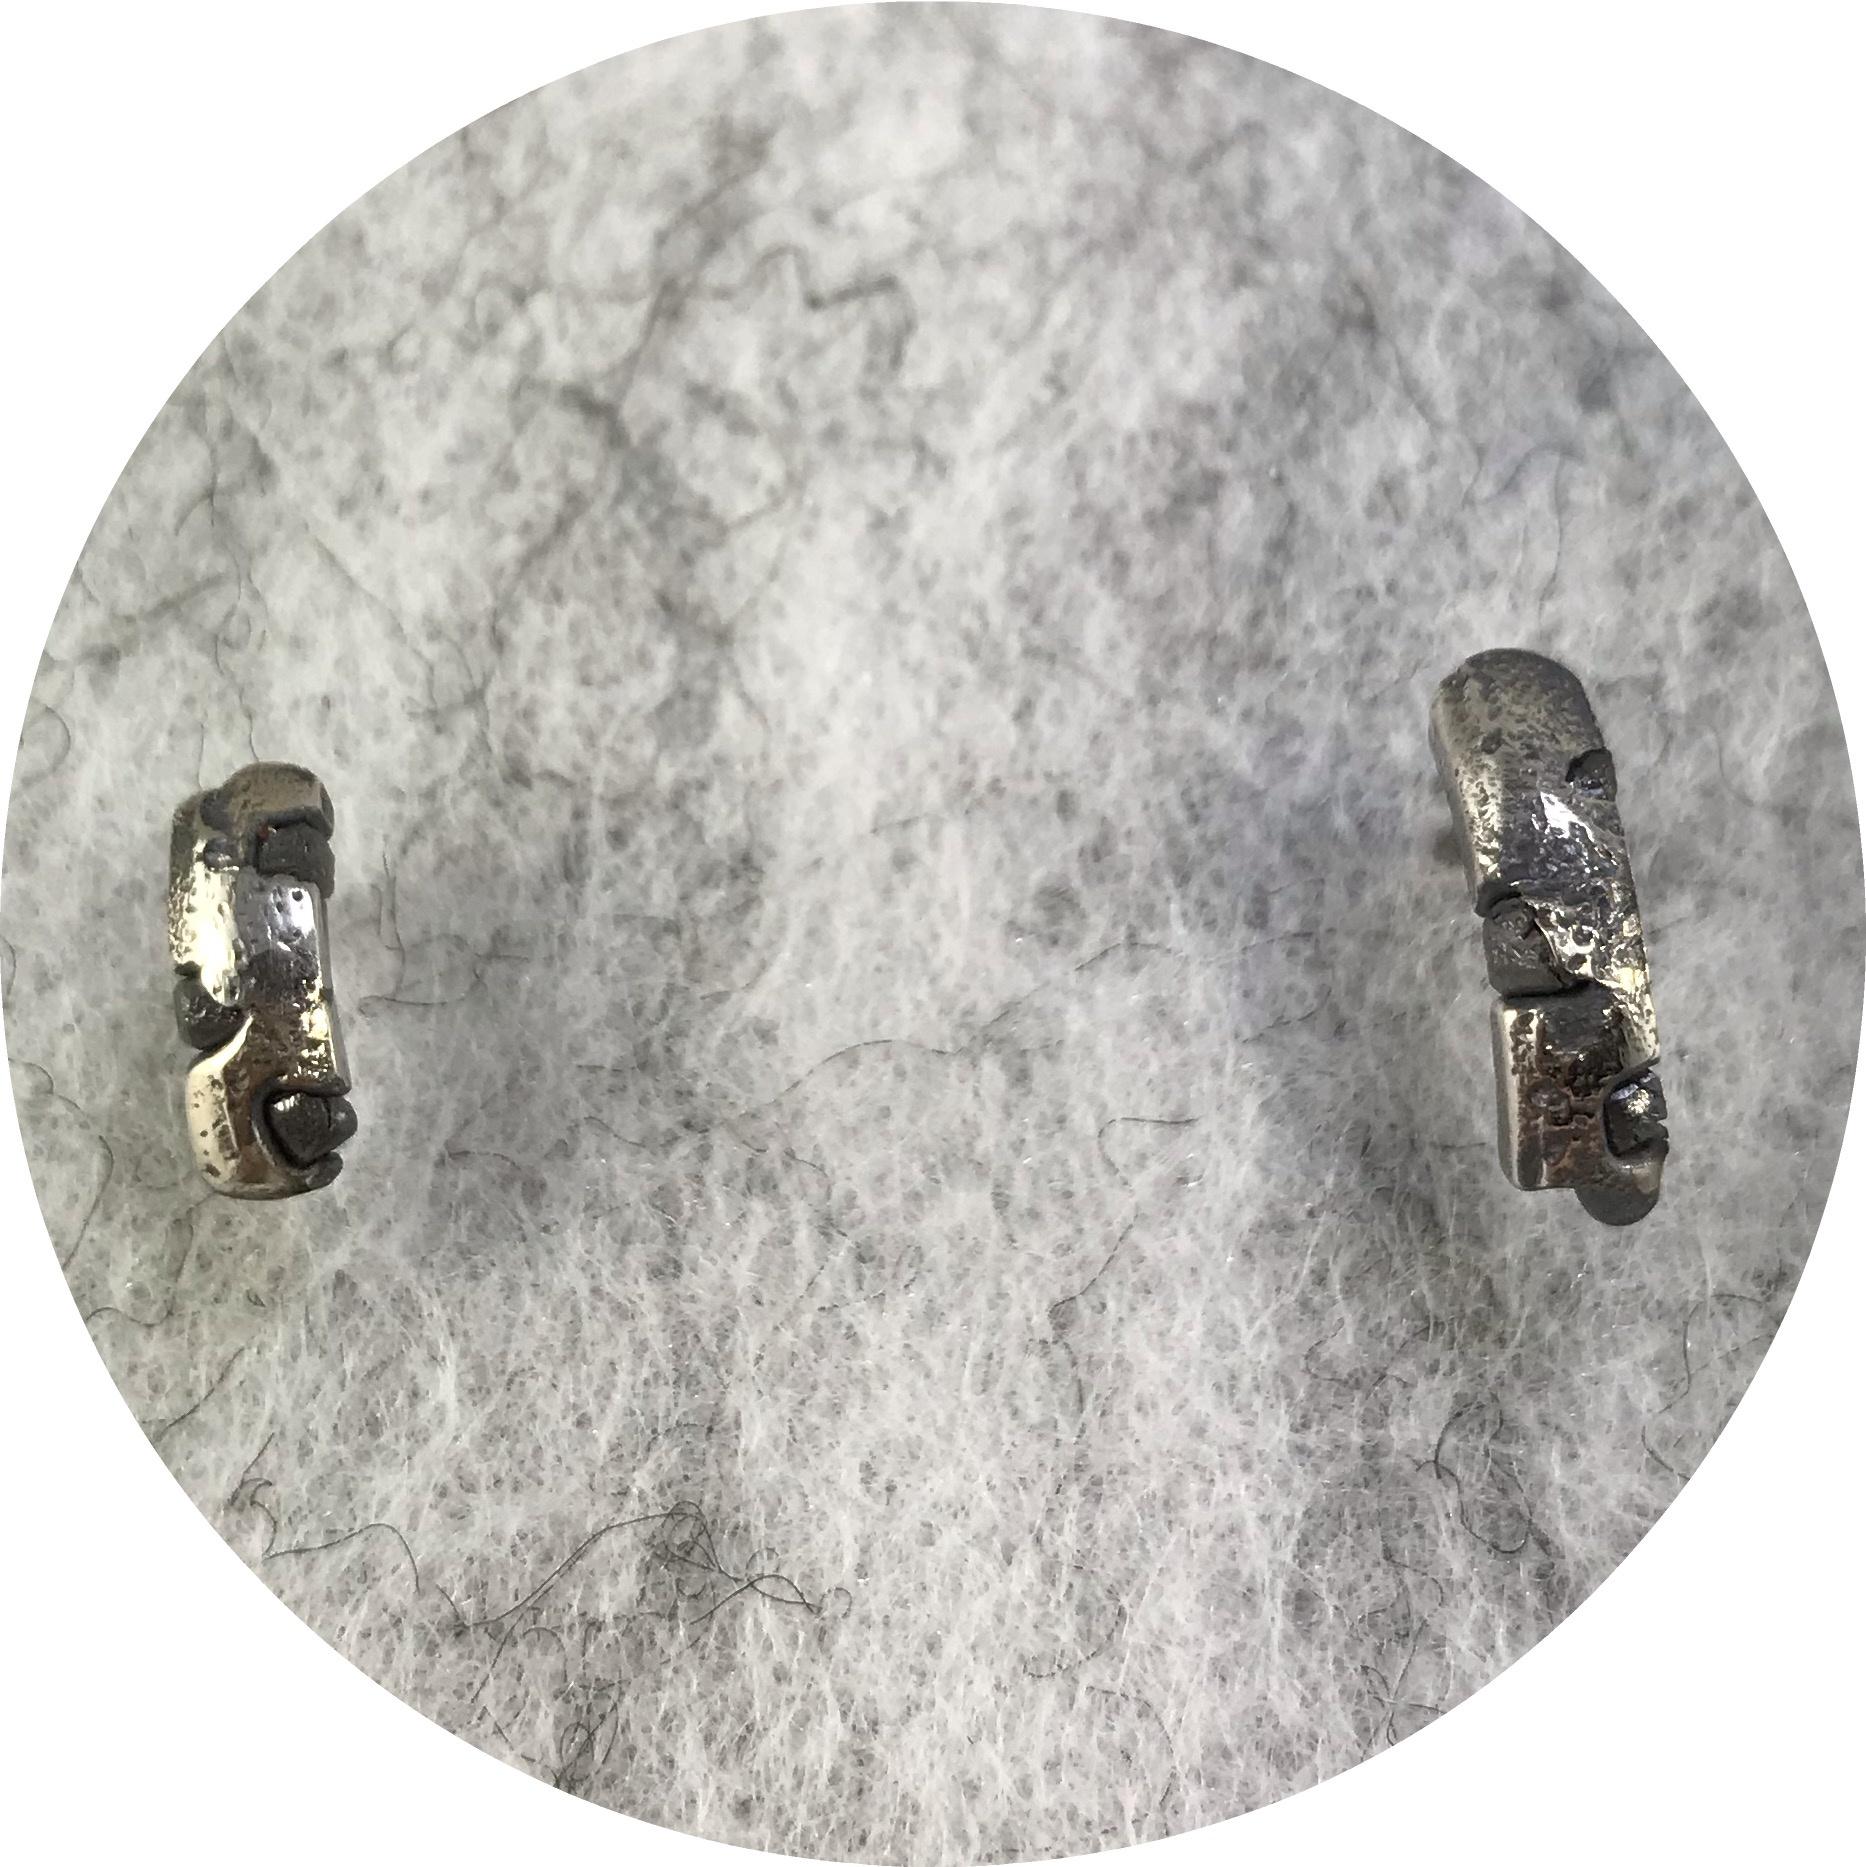 Kirra-Lea Caynes - 'Small Stud Earrings with Rough Diamonds', 925 silver, diamond